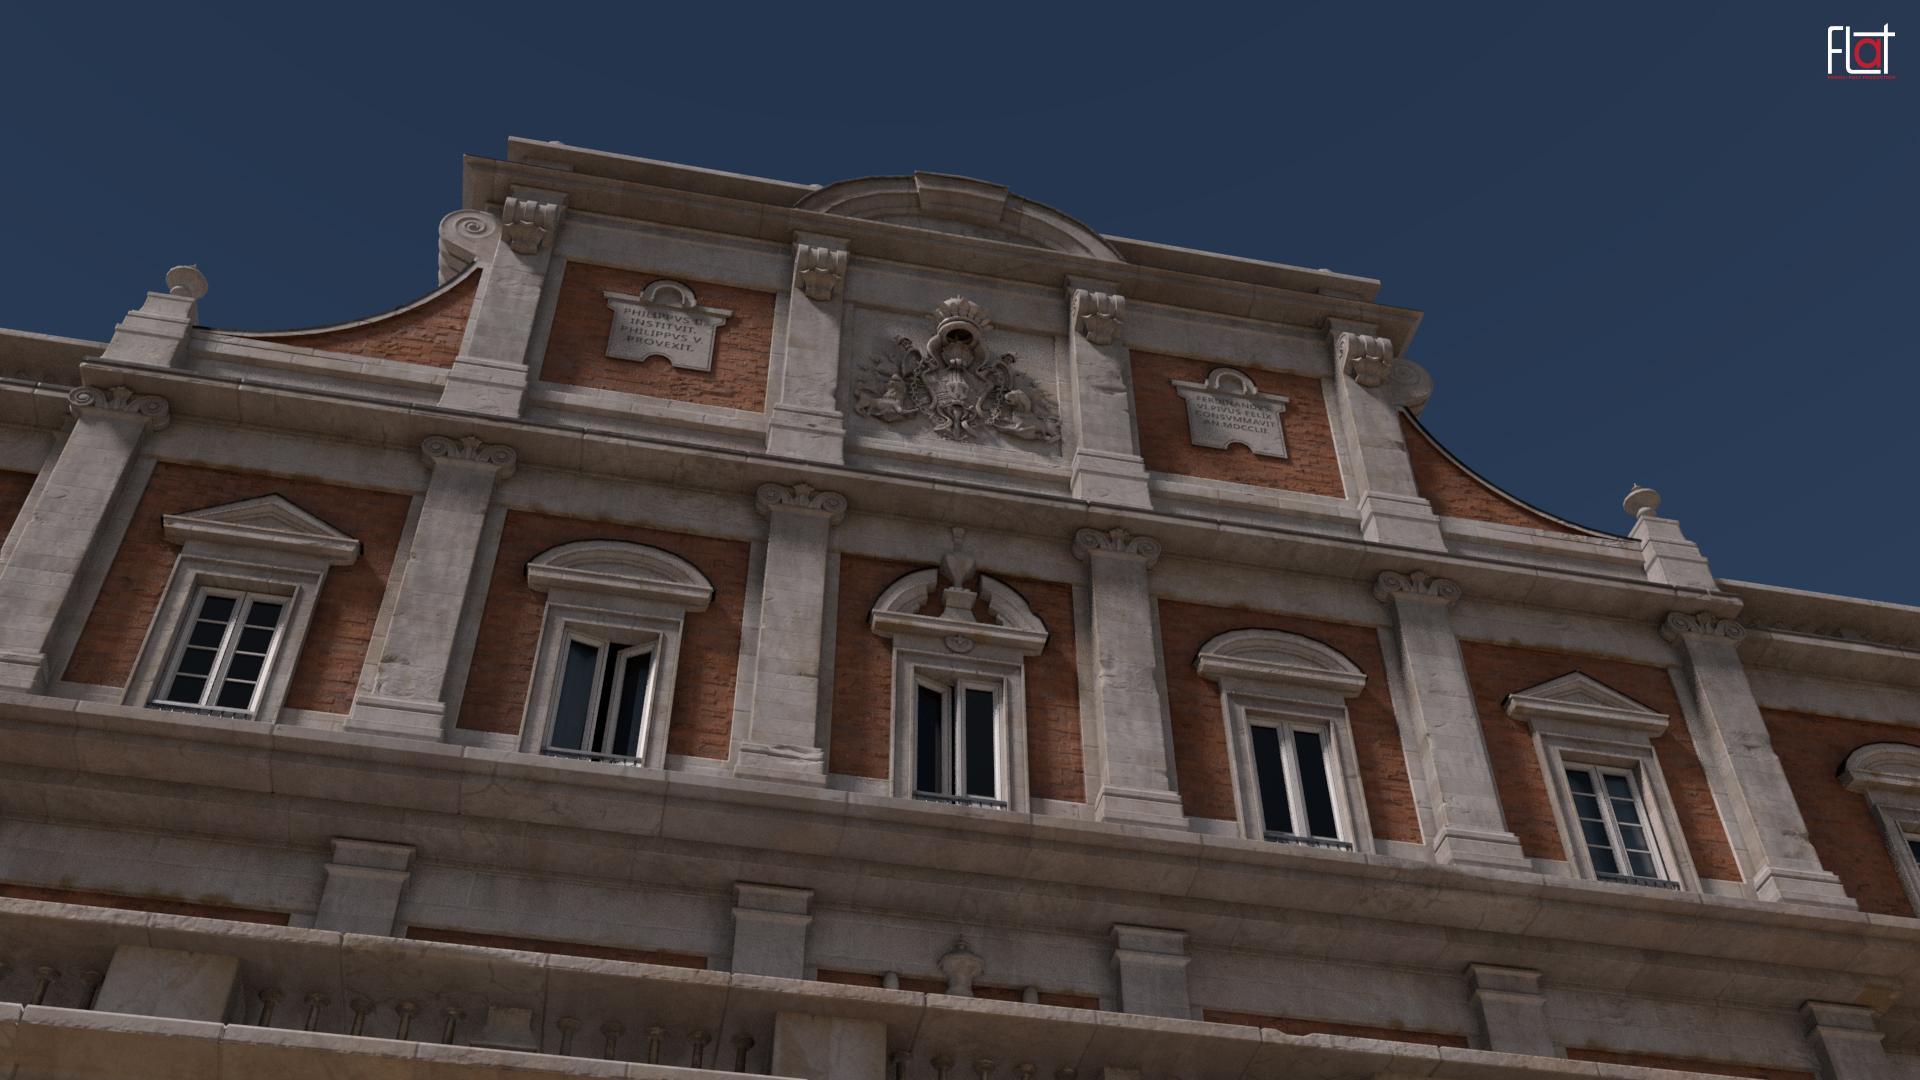 Architettura A Madrid palacio real de aranjuez - 3d model - [final] architettura e